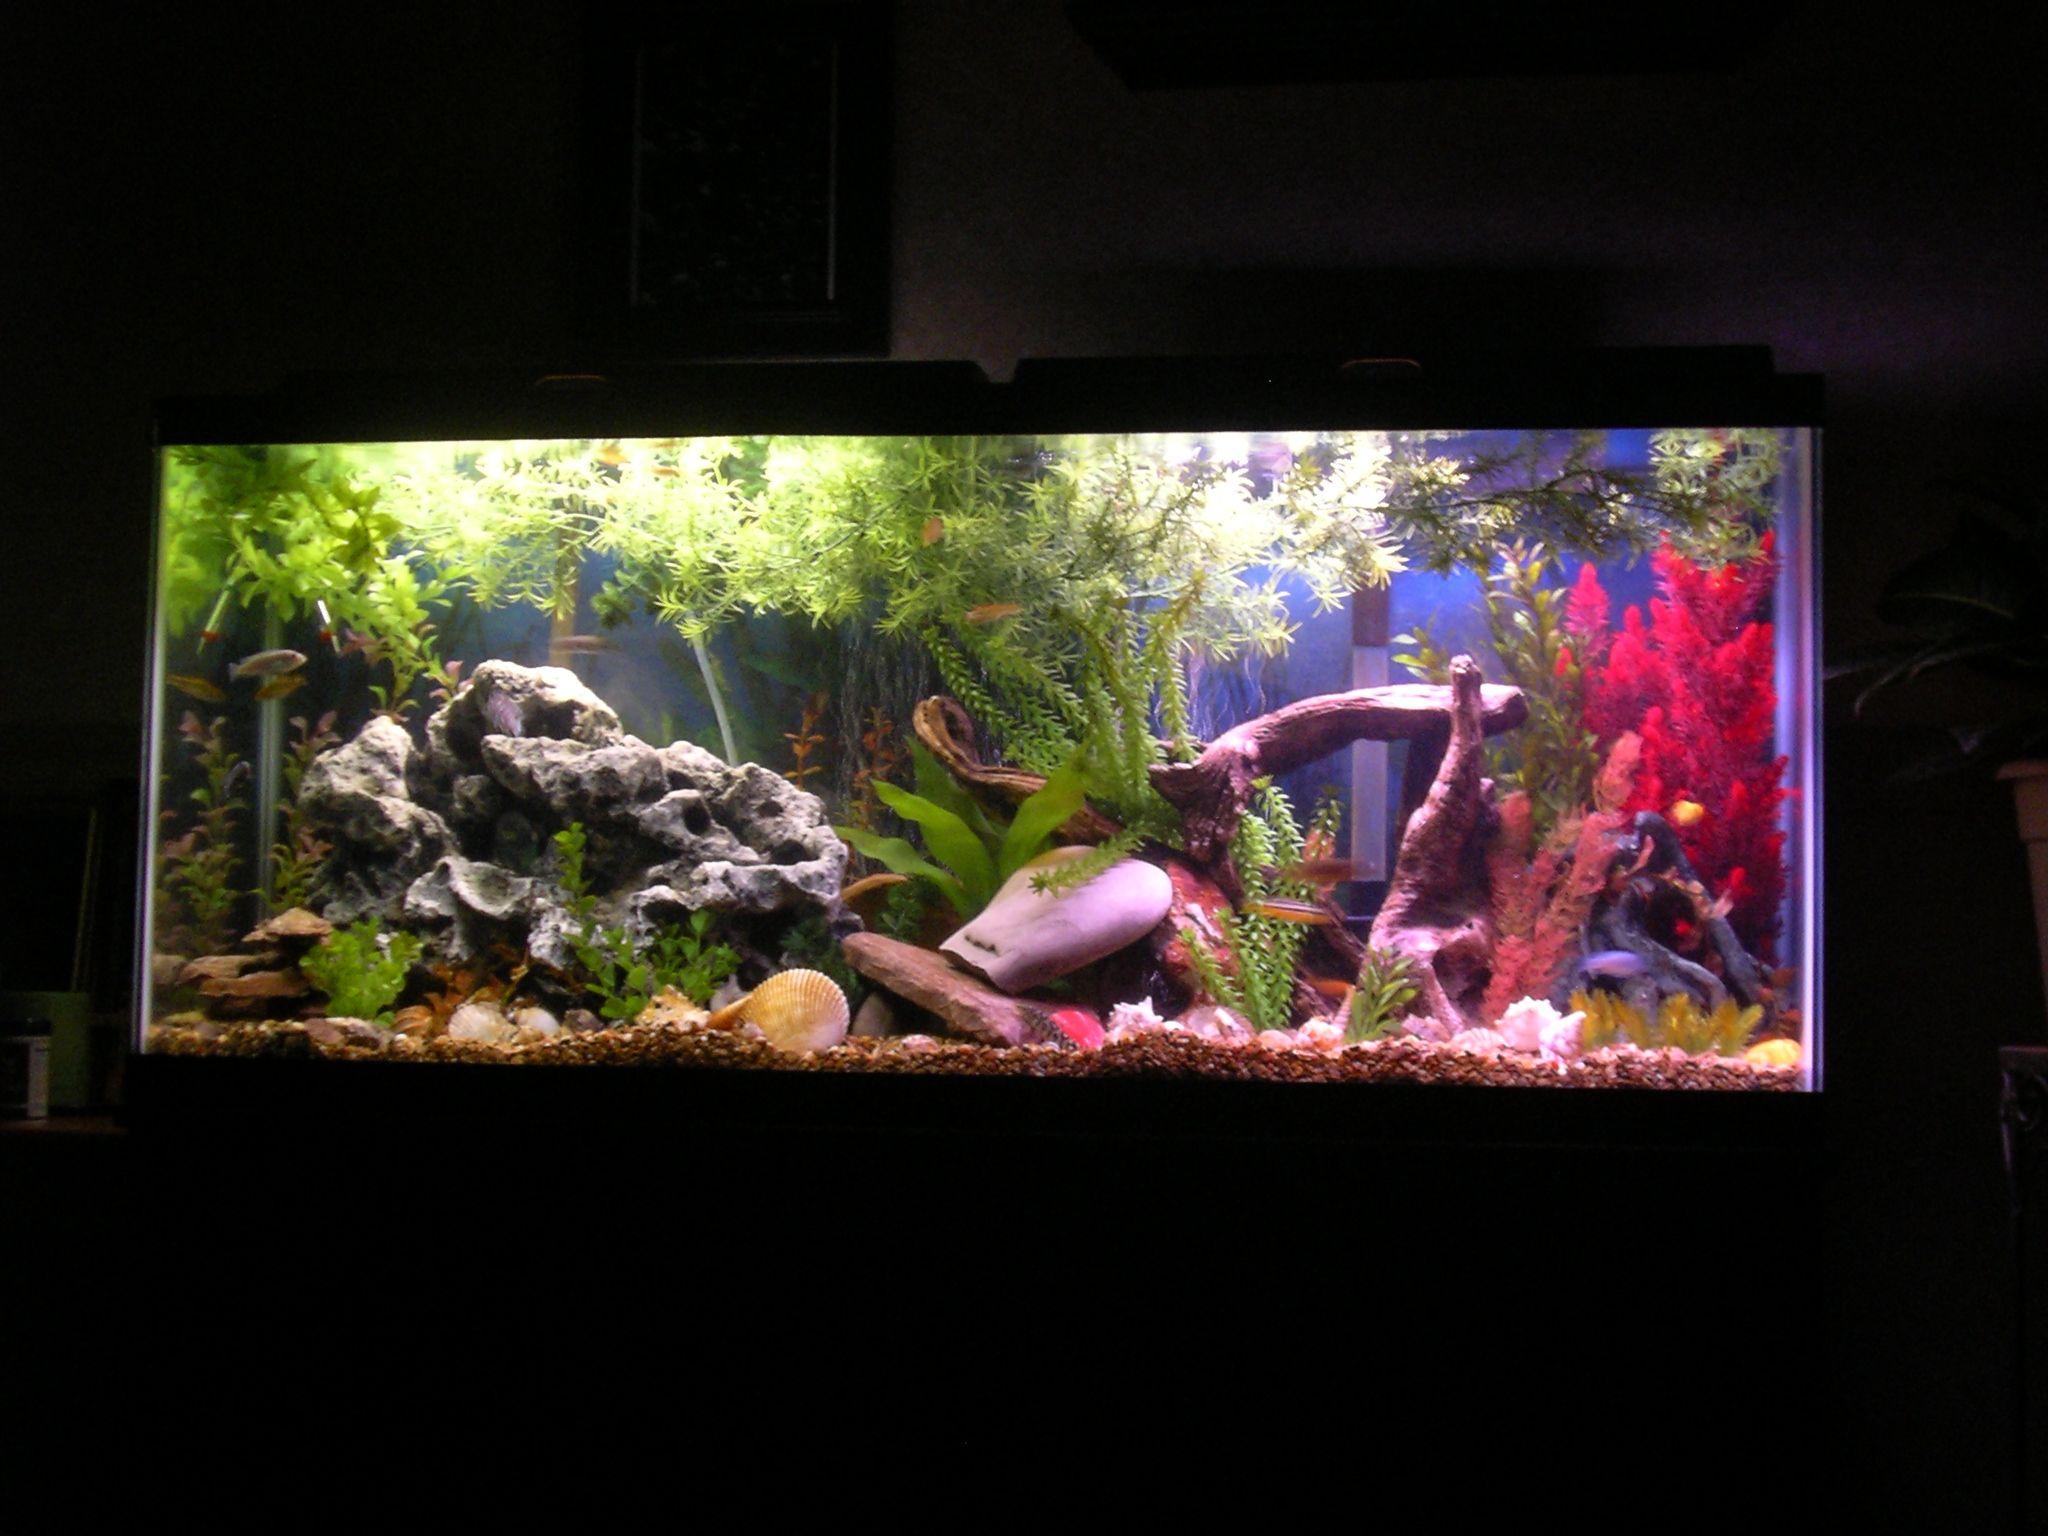 Fish aquarium in chandigarh - 55 River Tank Cichlids Com My 55 Gallon Malawi Cichlid Tank